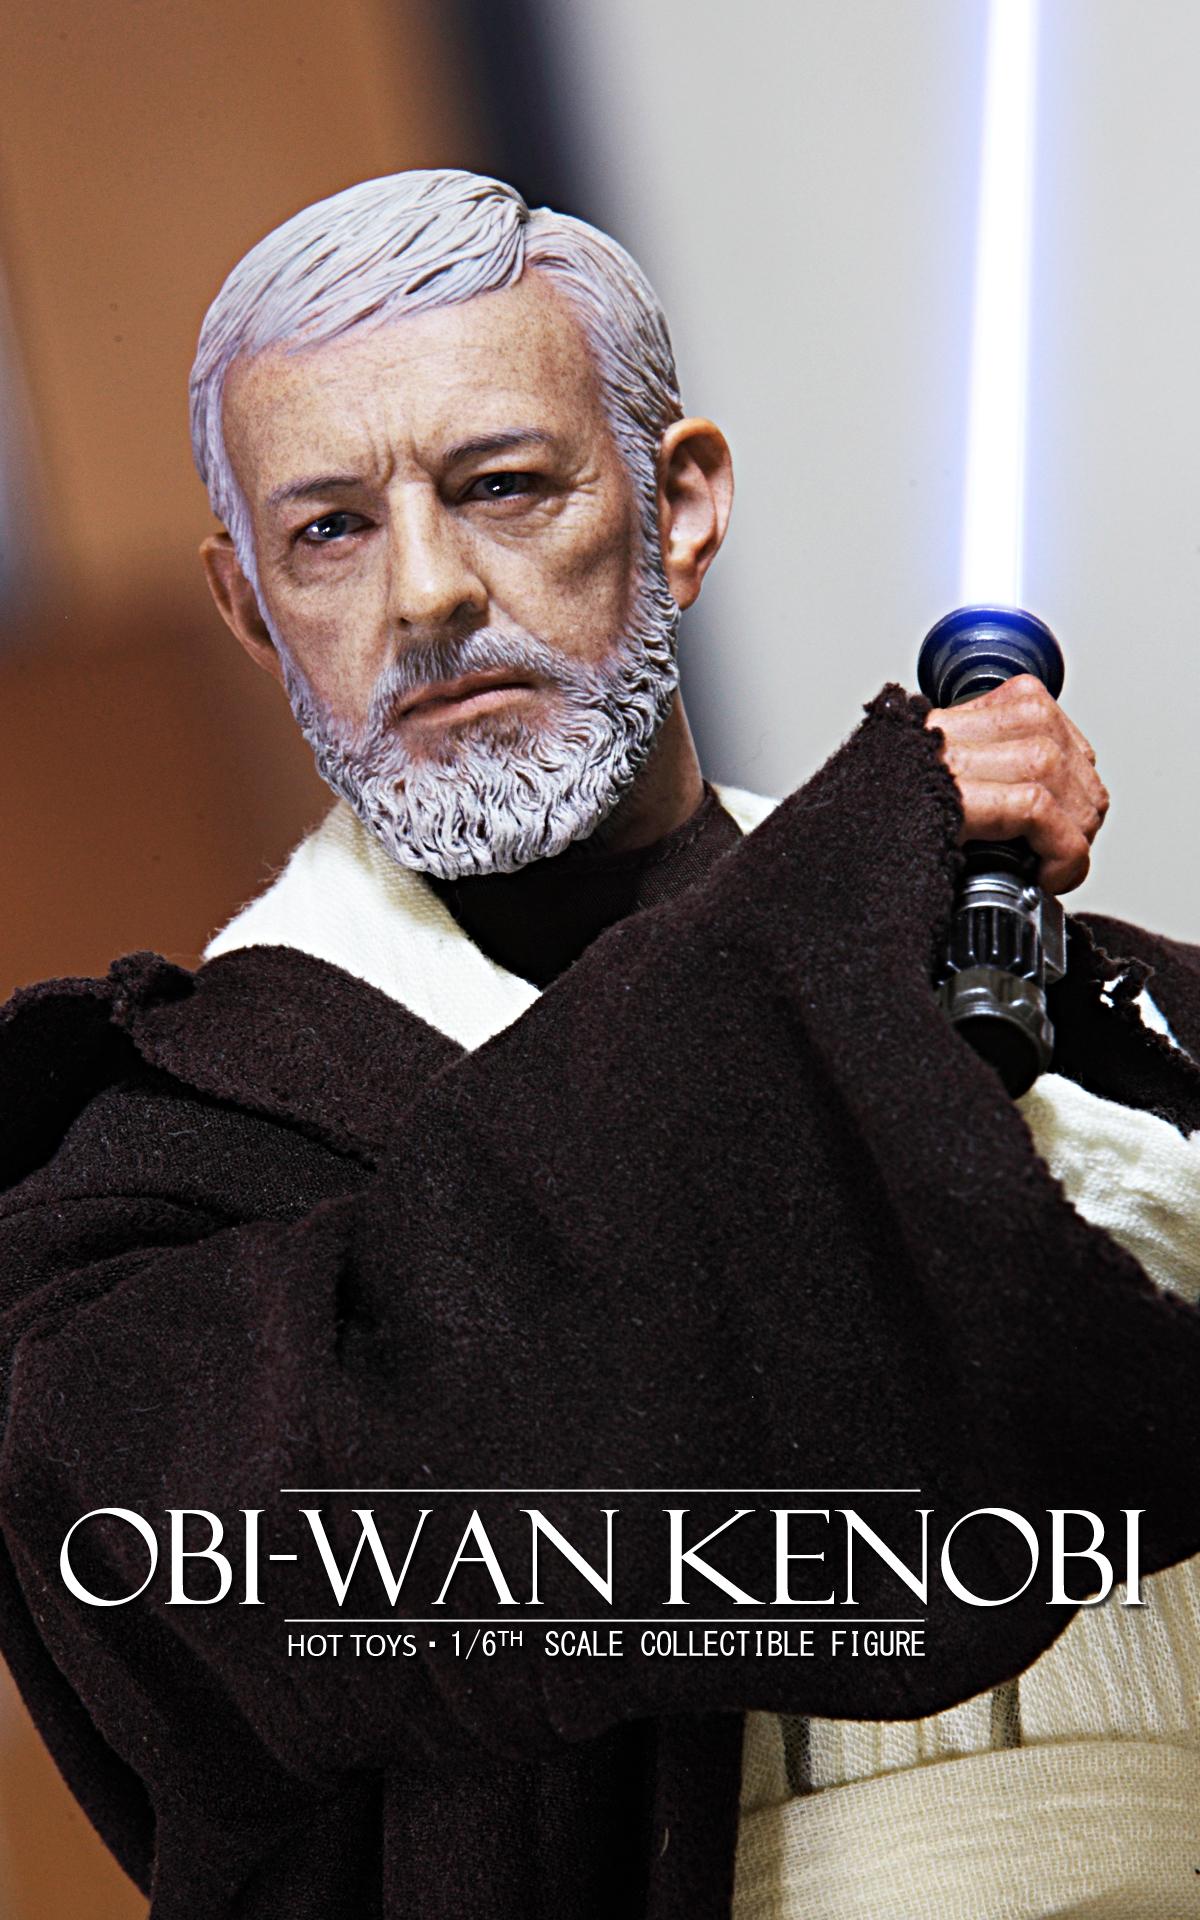 hottoys-star-wars-episode-IV-a-new-hope-obi-wan-kenobi-picture08